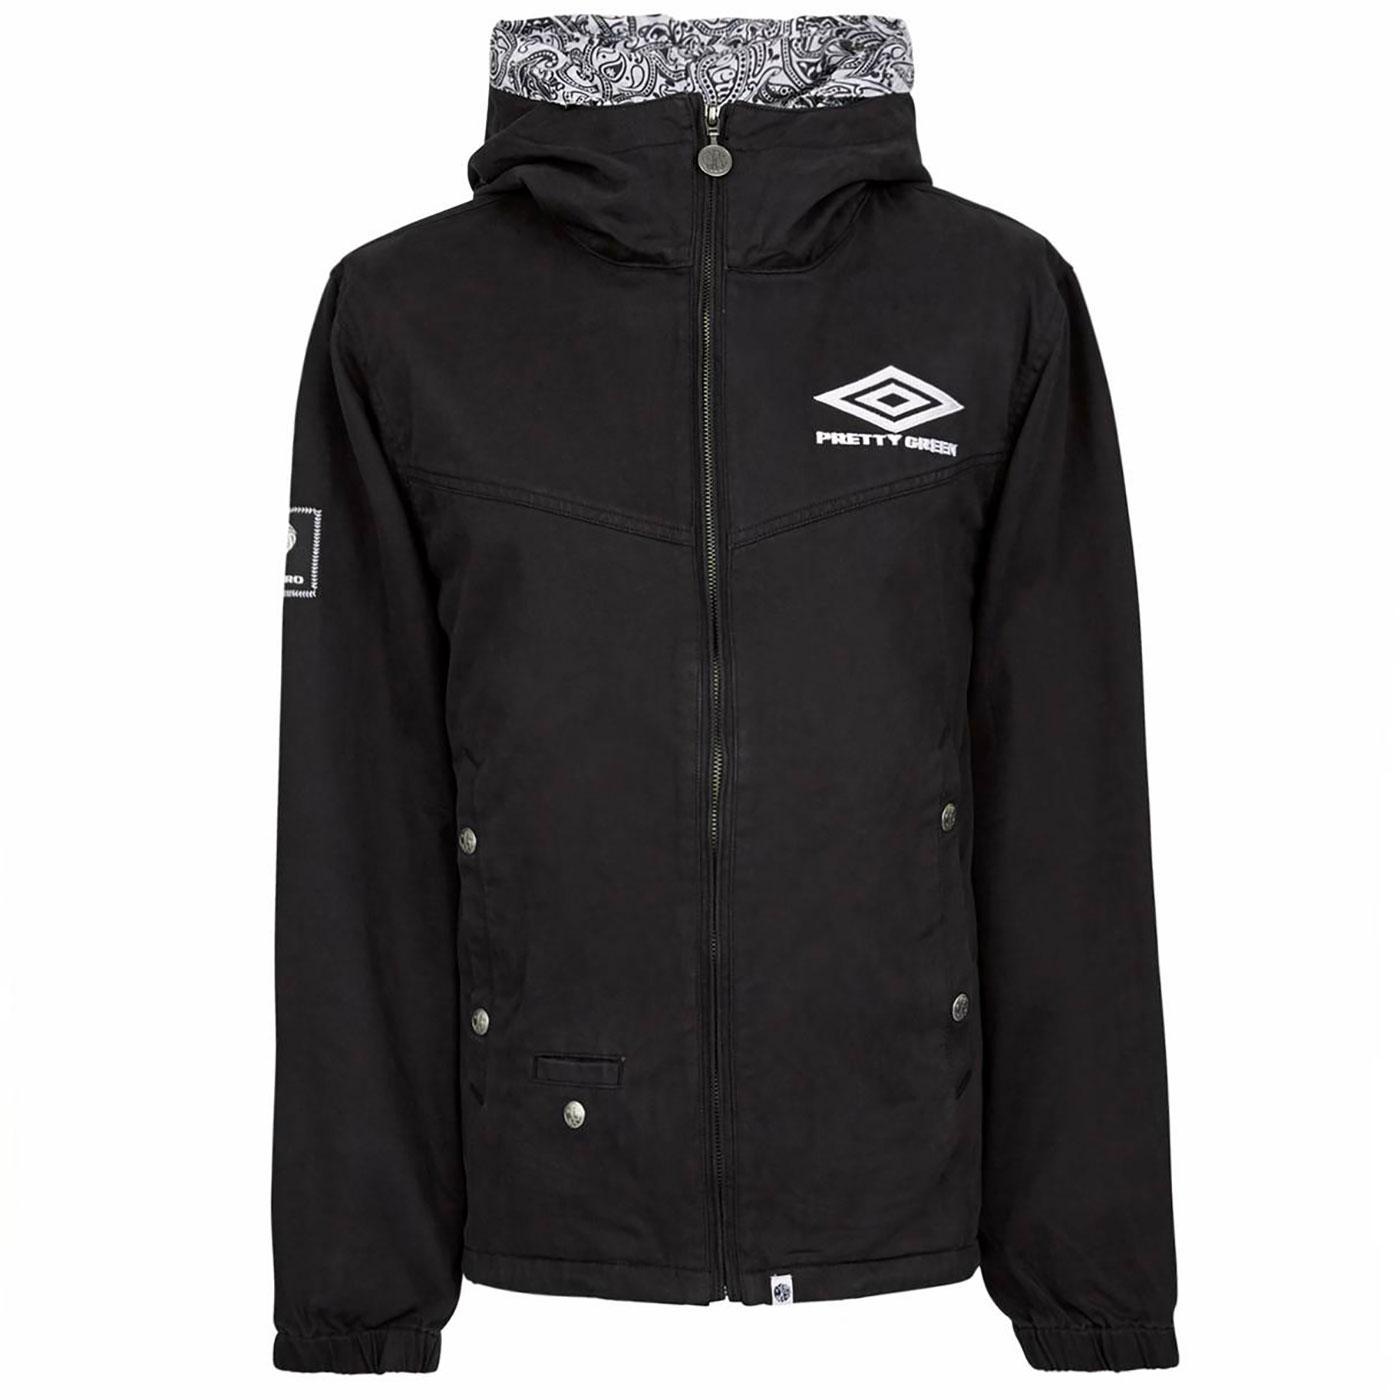 PRETTY GREEN X UMBRO Retro Zip Up Hooded Jacket